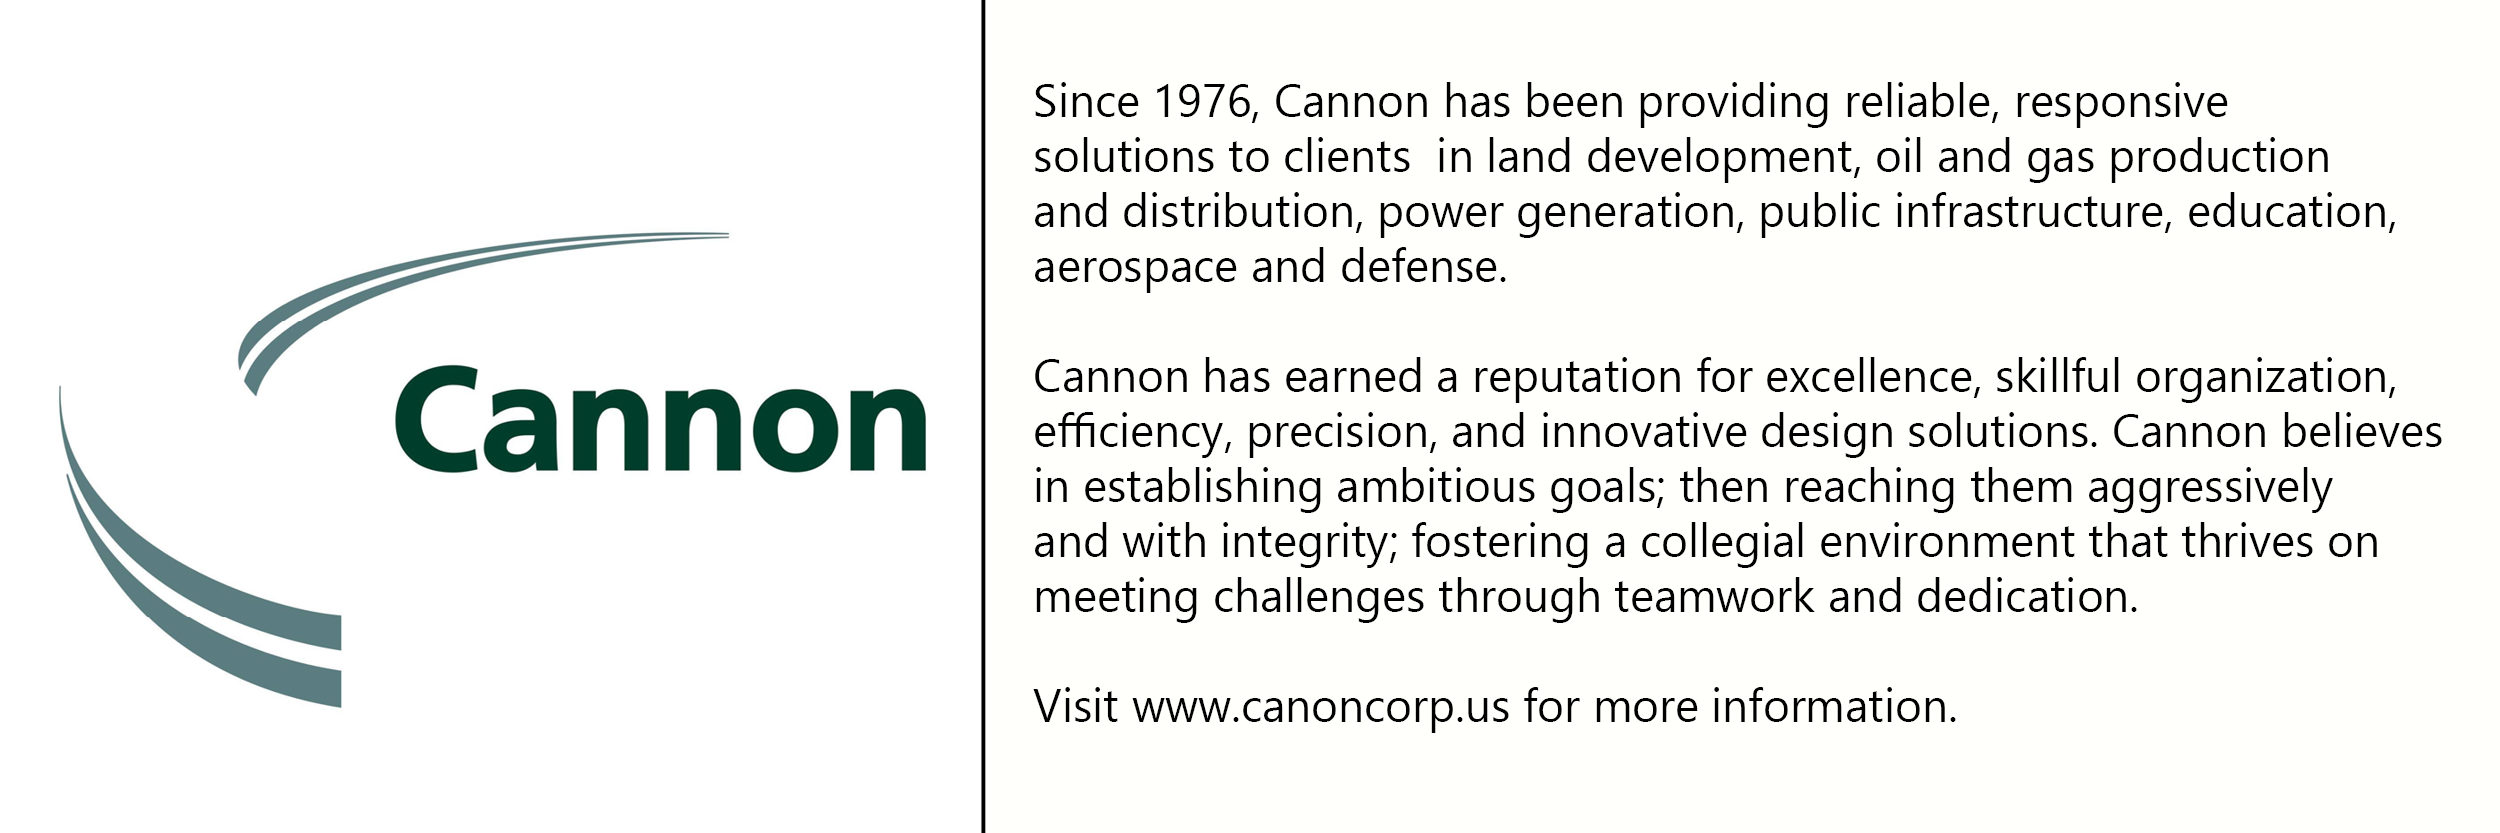 Cannon  logo with description of company